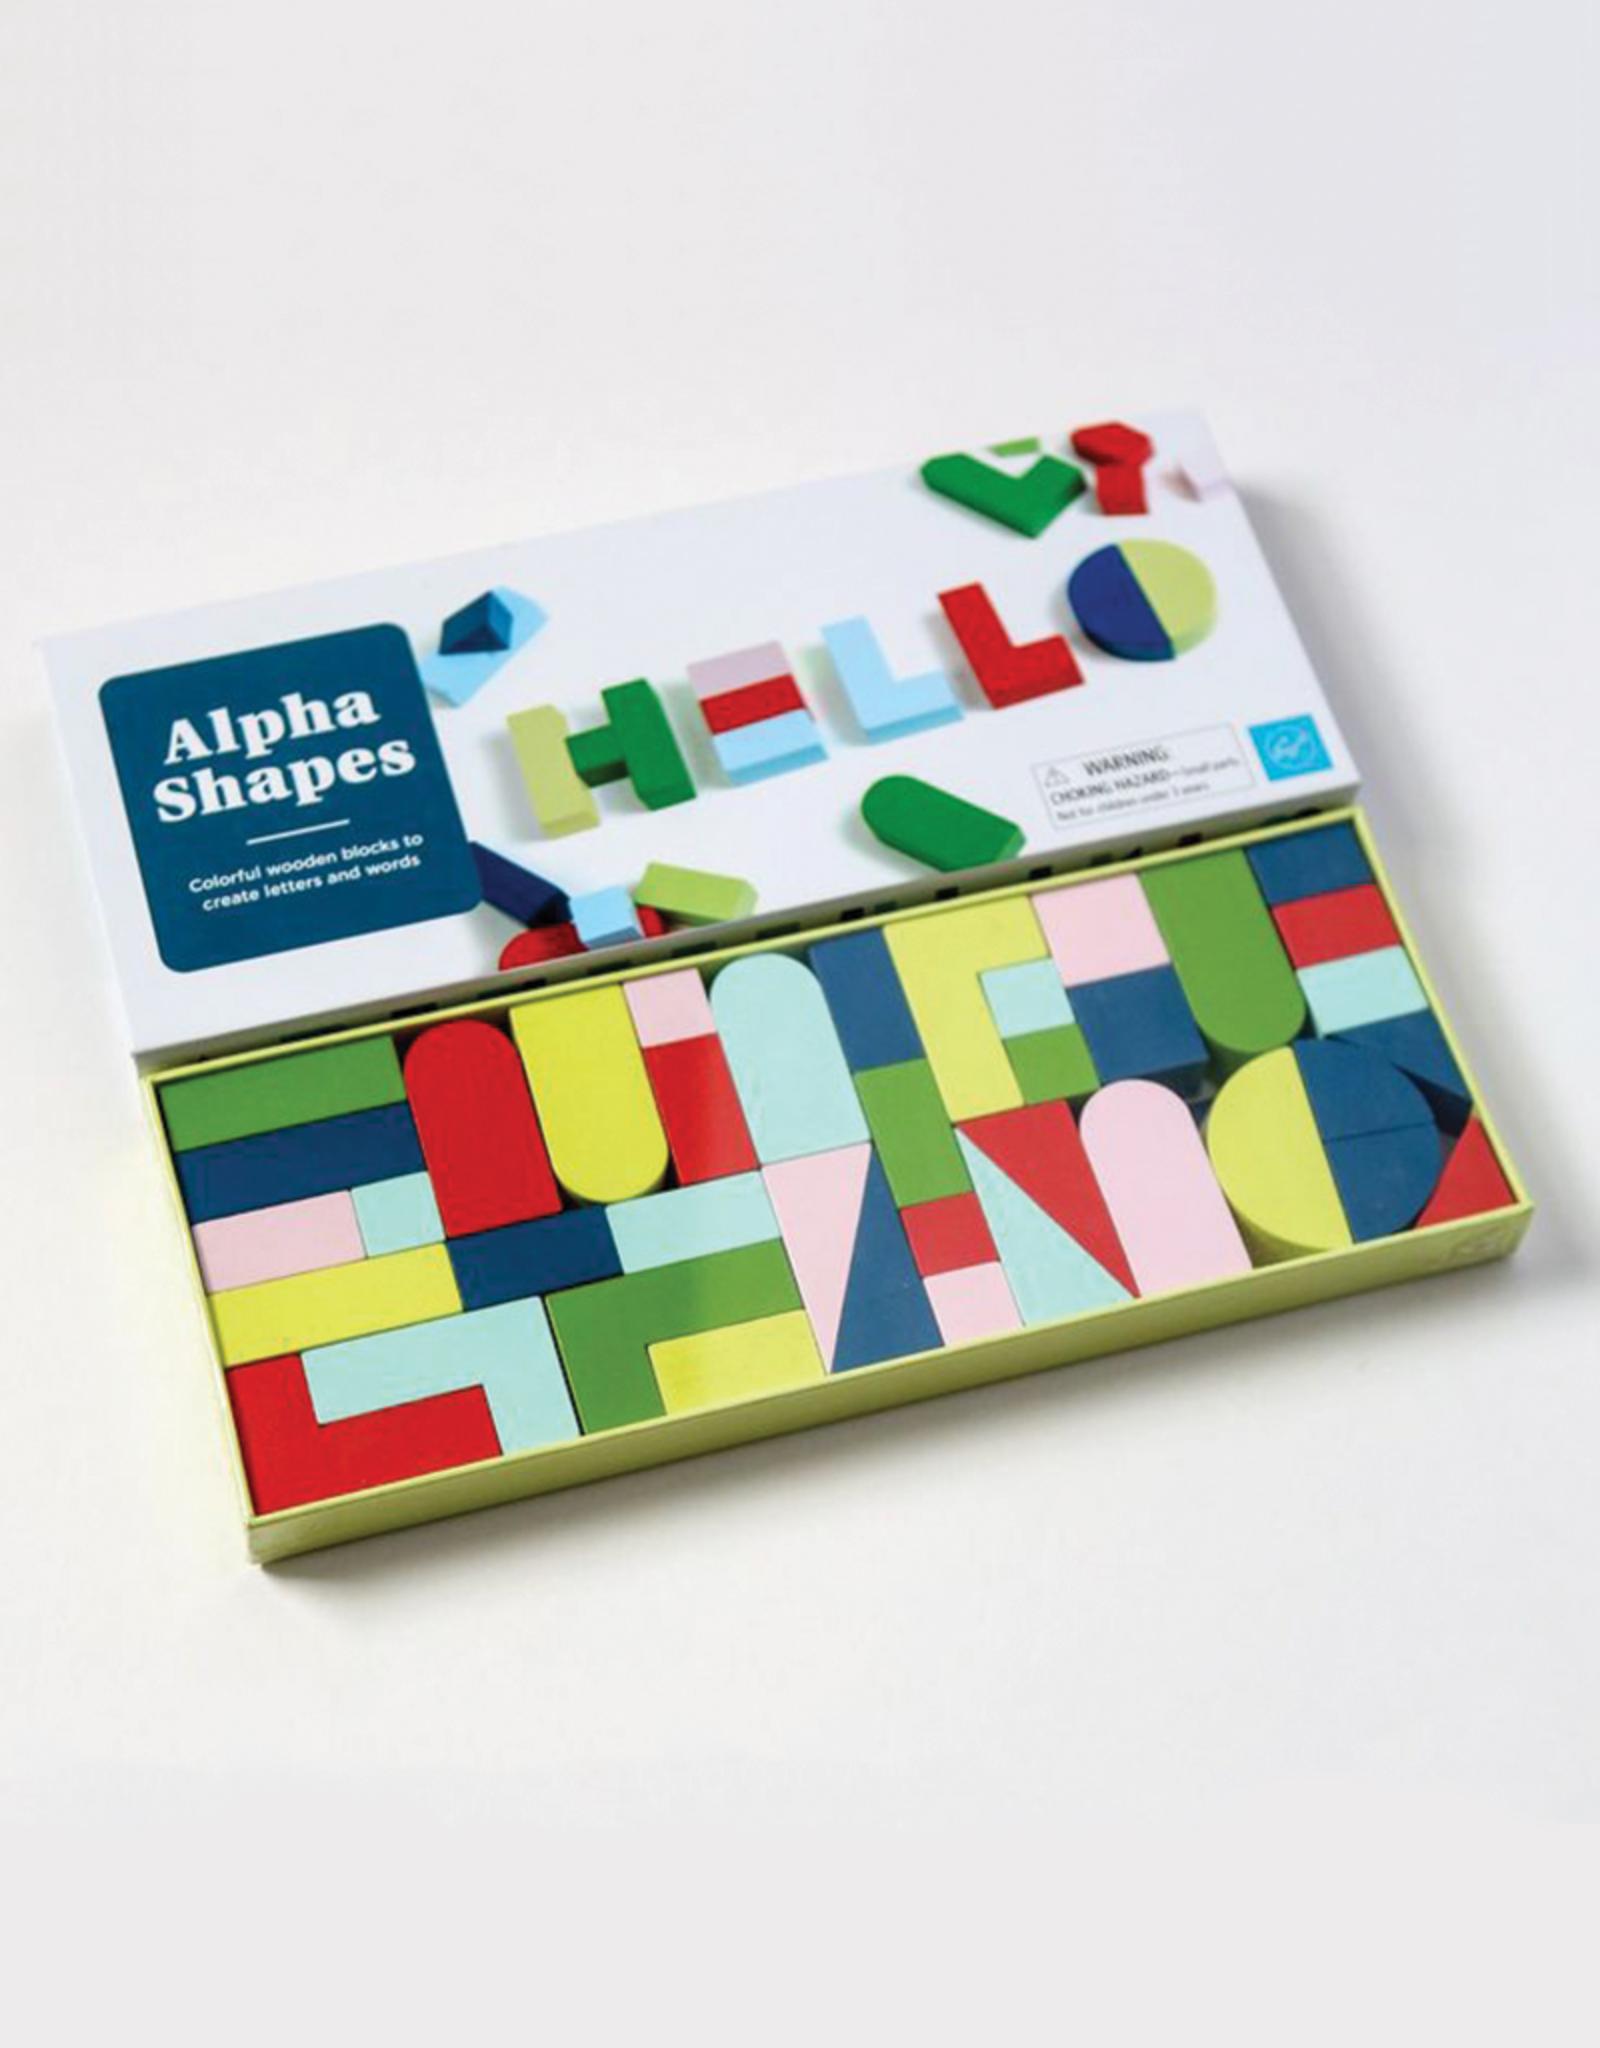 Alpha Shapes Wooden Blocks